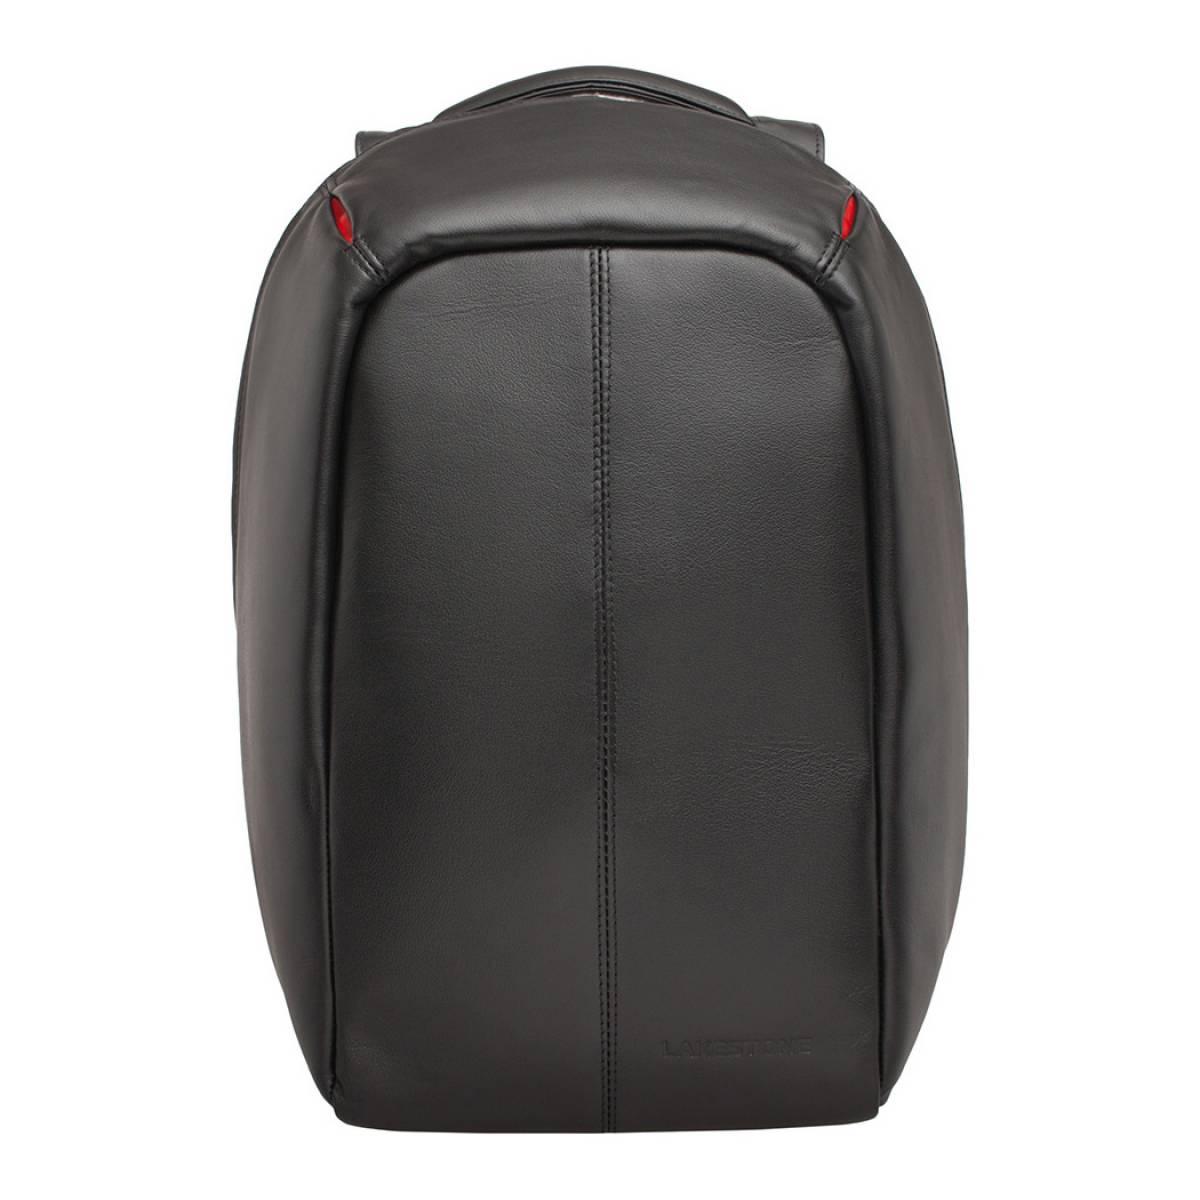 Мужской кожаный рюкзак Blandford Black